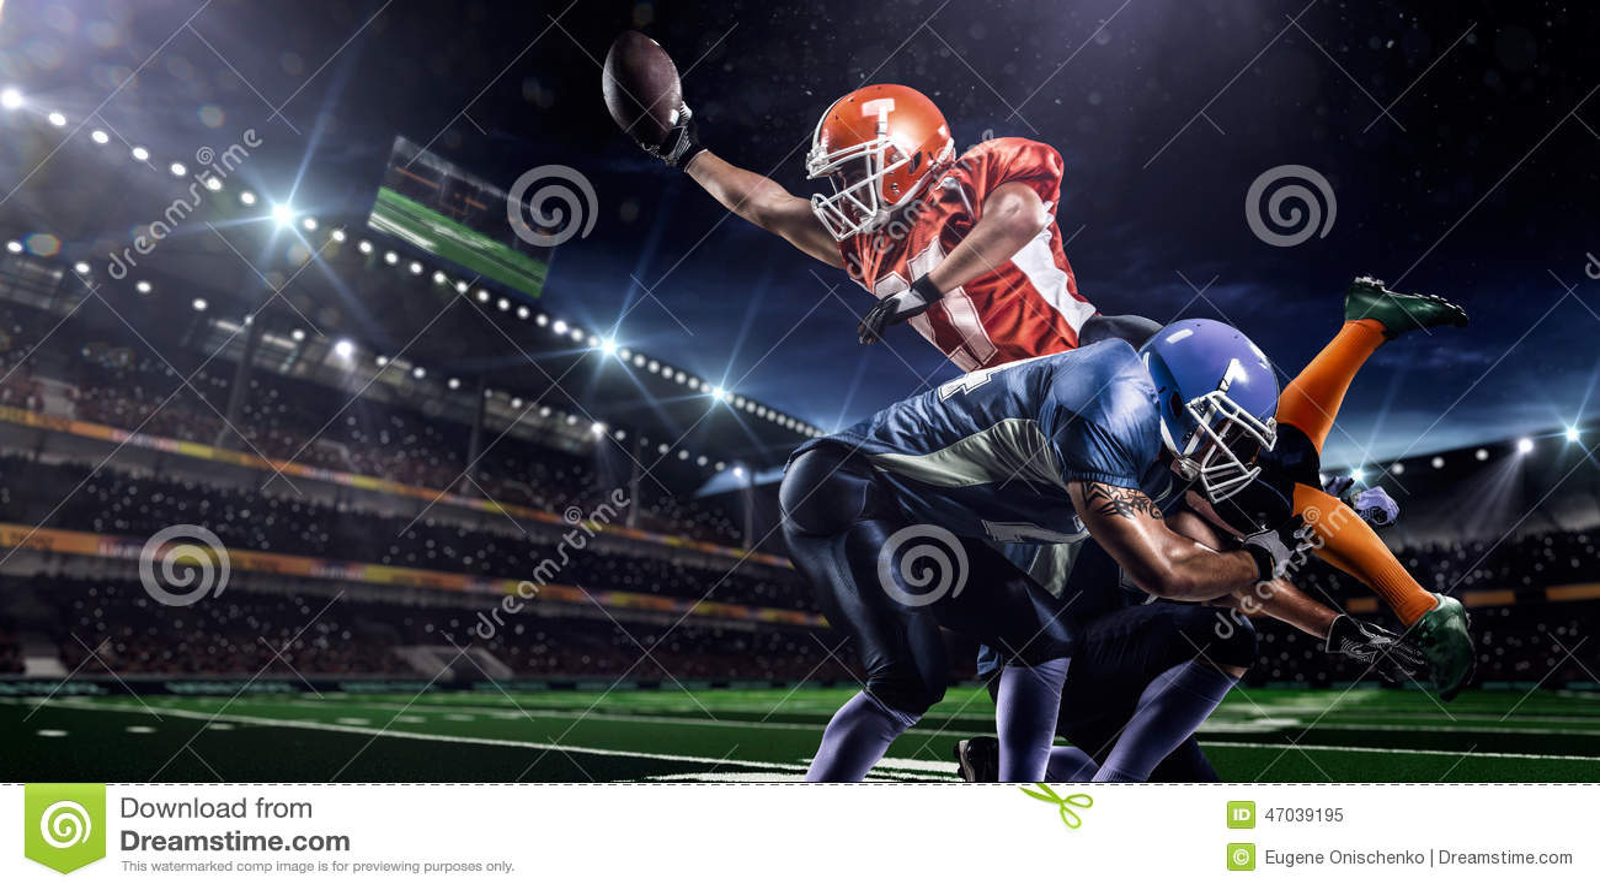 Amerikaanse voetbalster in actie betreffende stadion